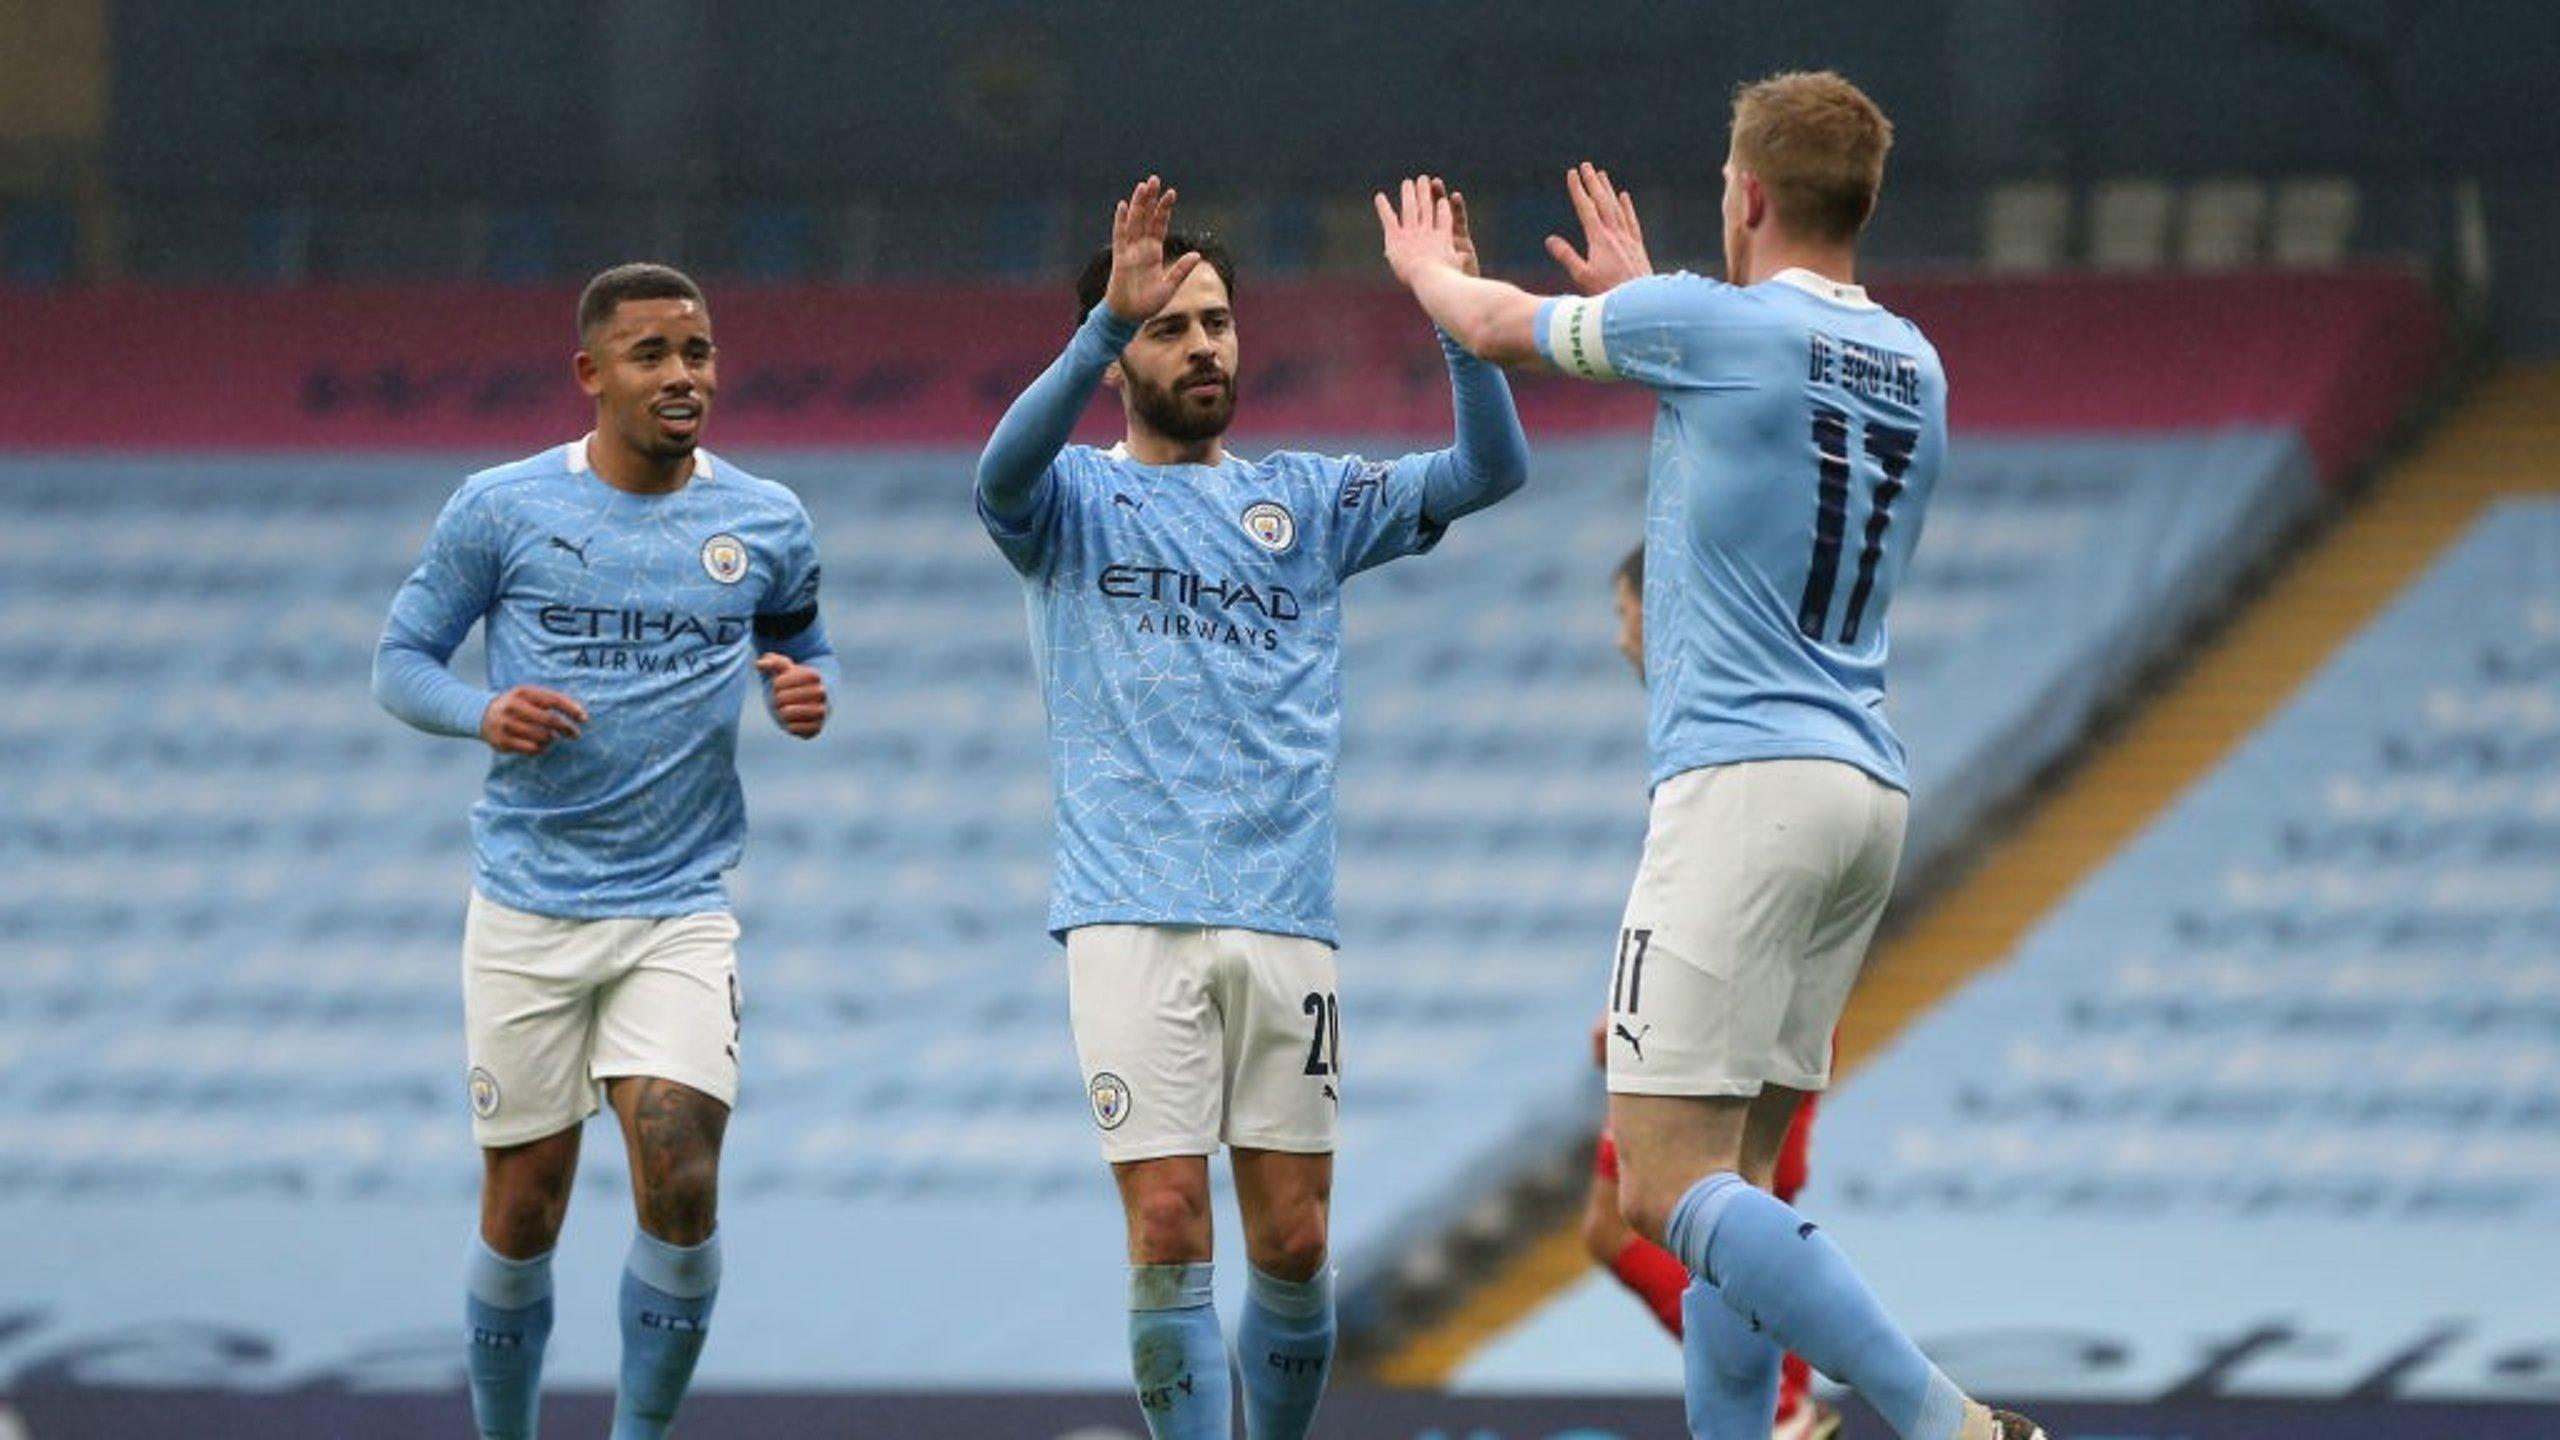 Gallery: Bernardo brace inspires cup win